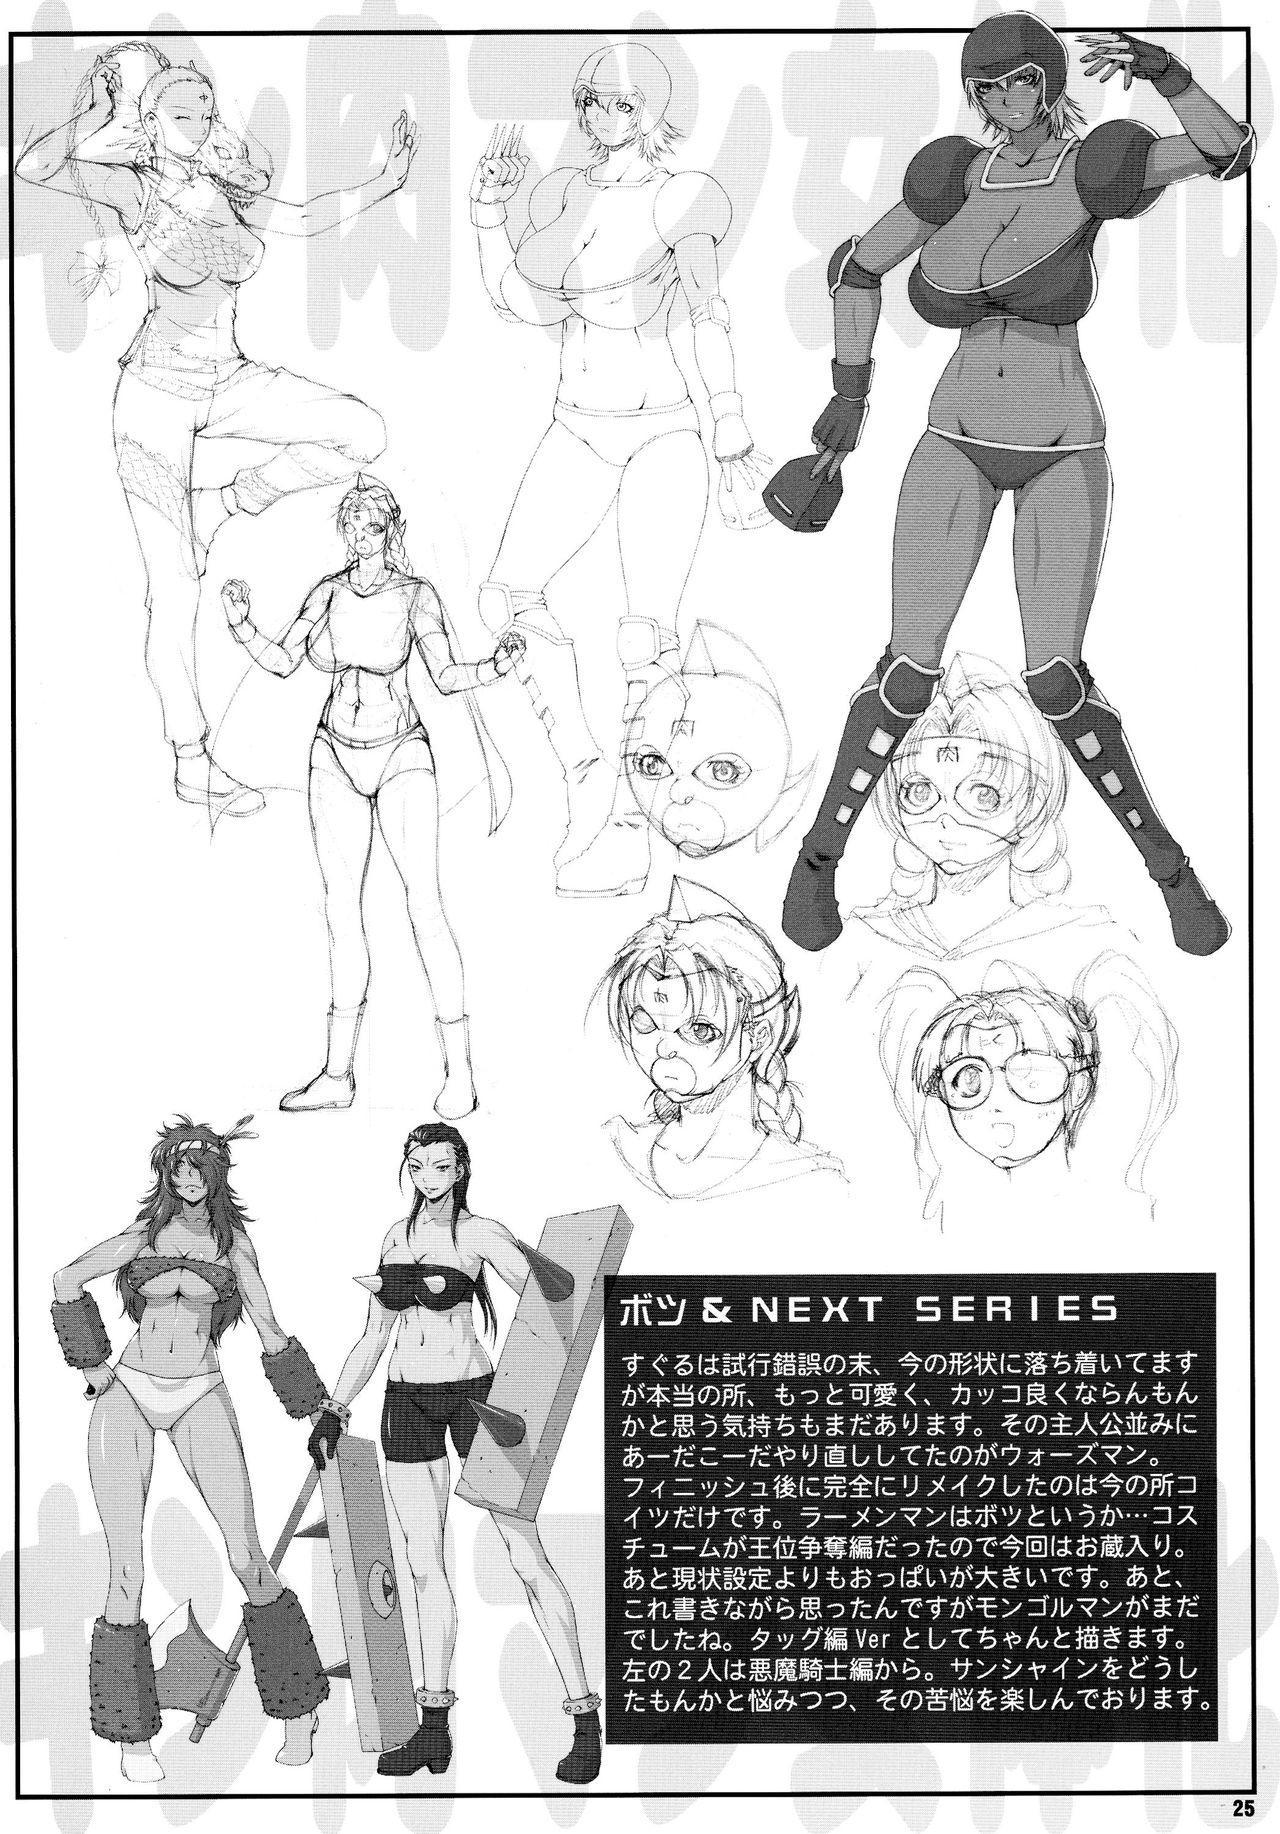 Misoka no 5 24